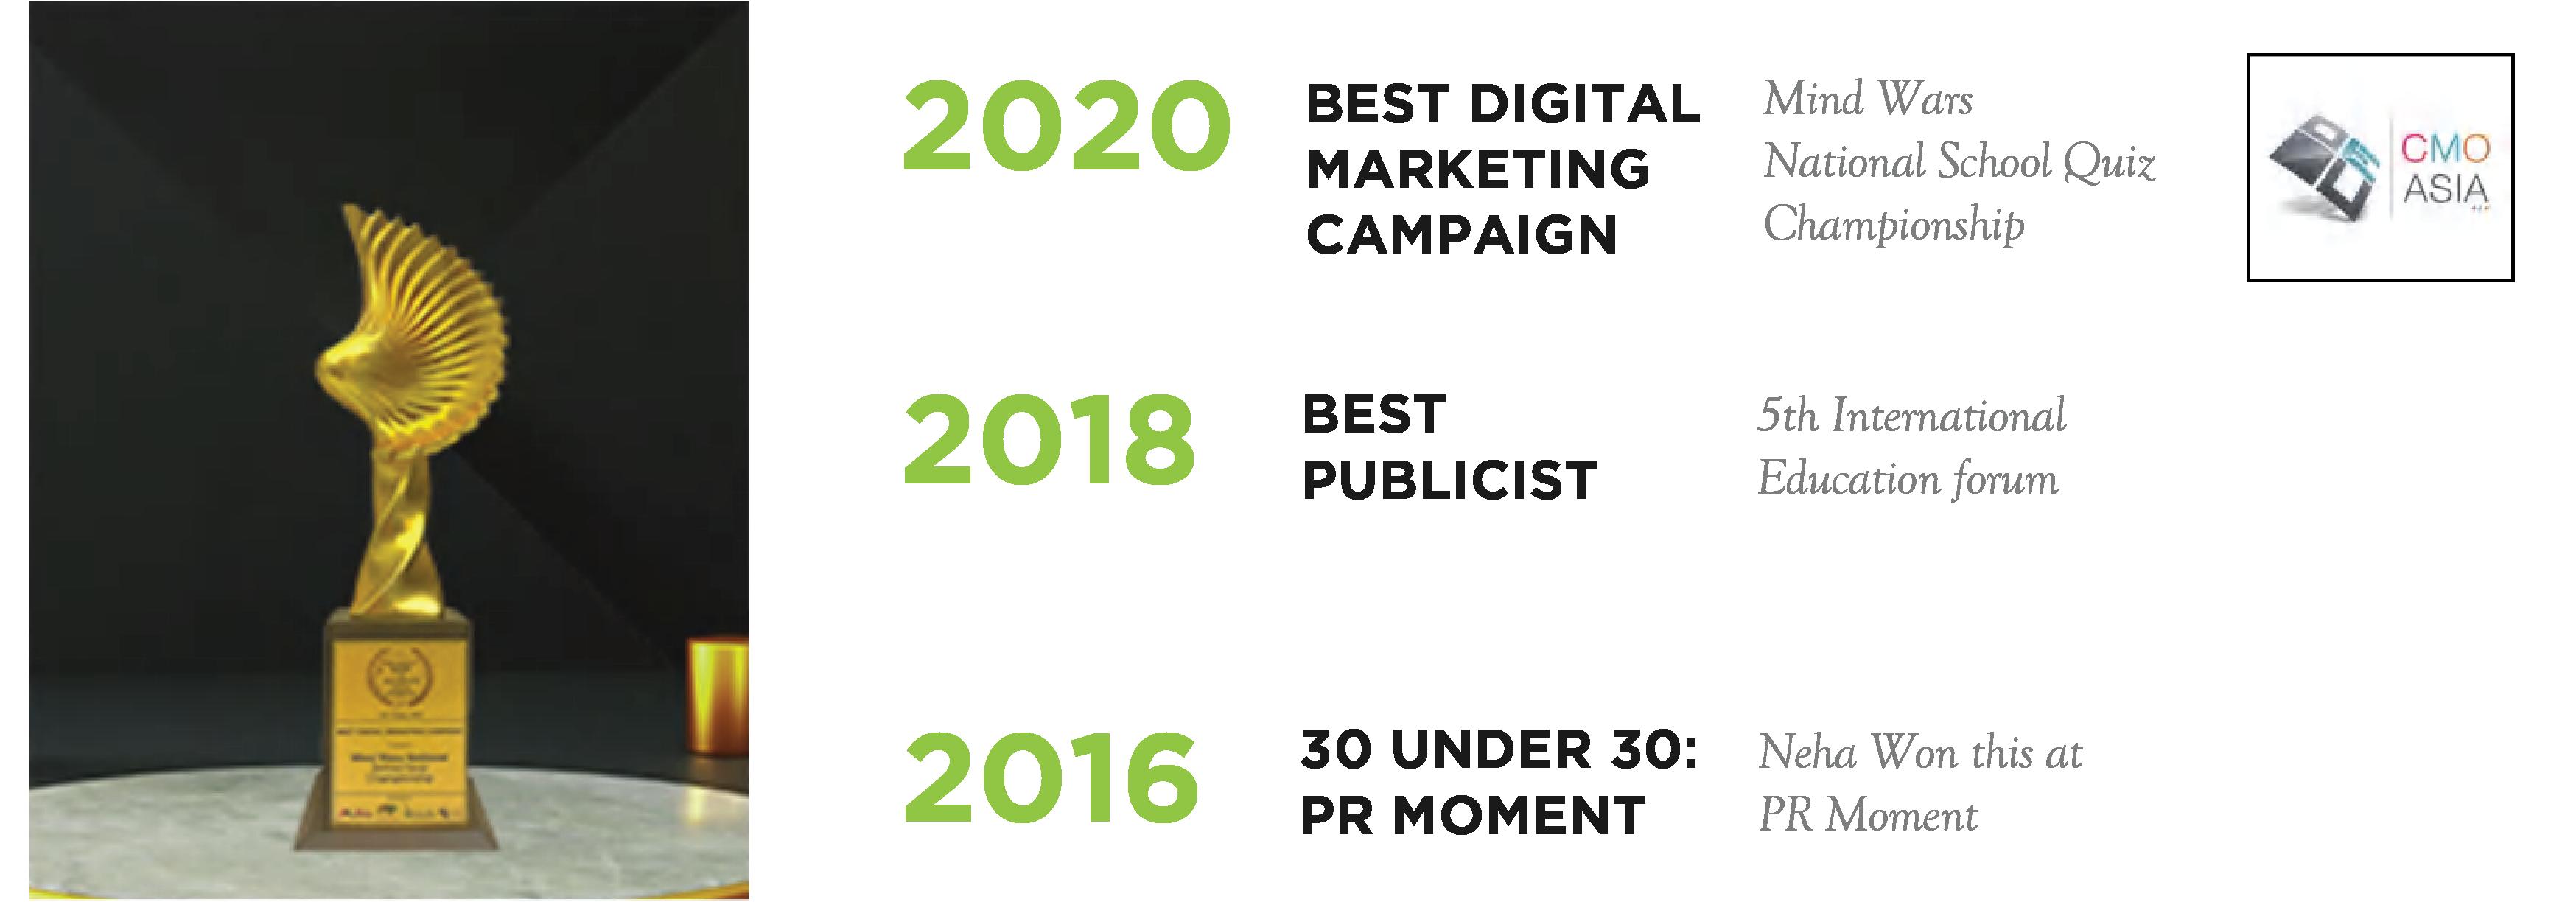 BB_Profile_Awards 2020 - 2016-04